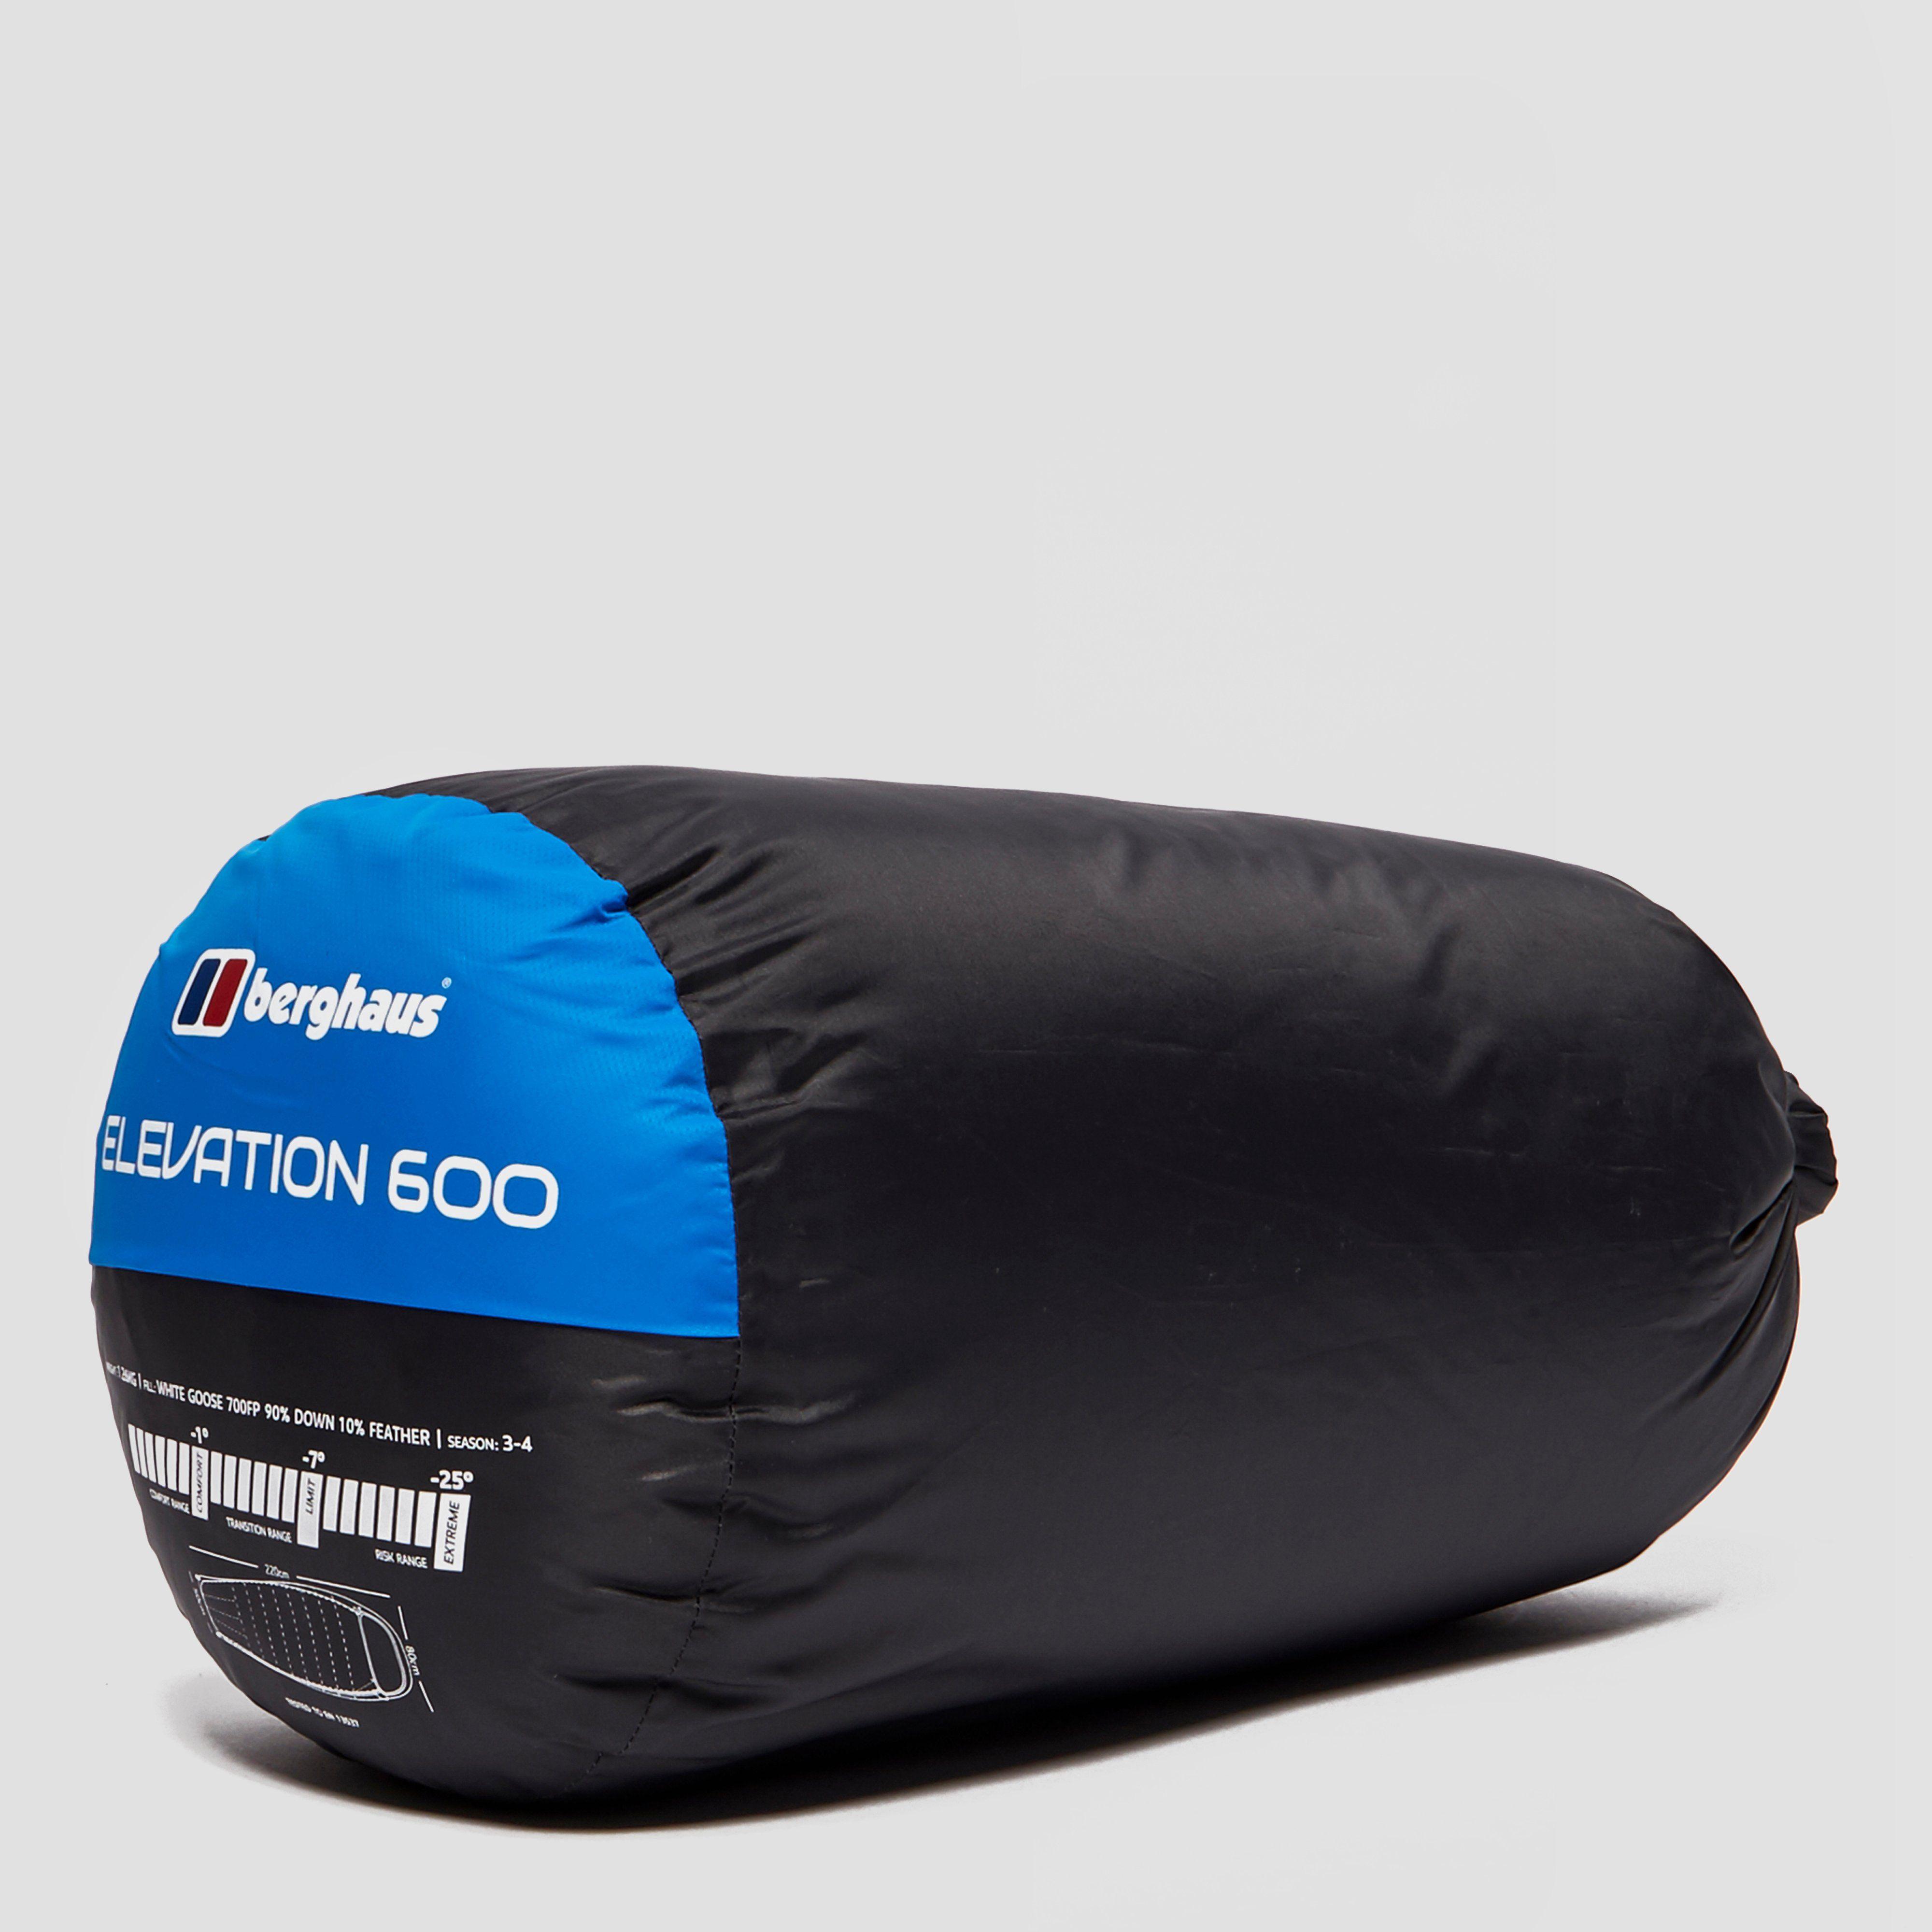 Berghaus Elevation 600 Sleeping Bag